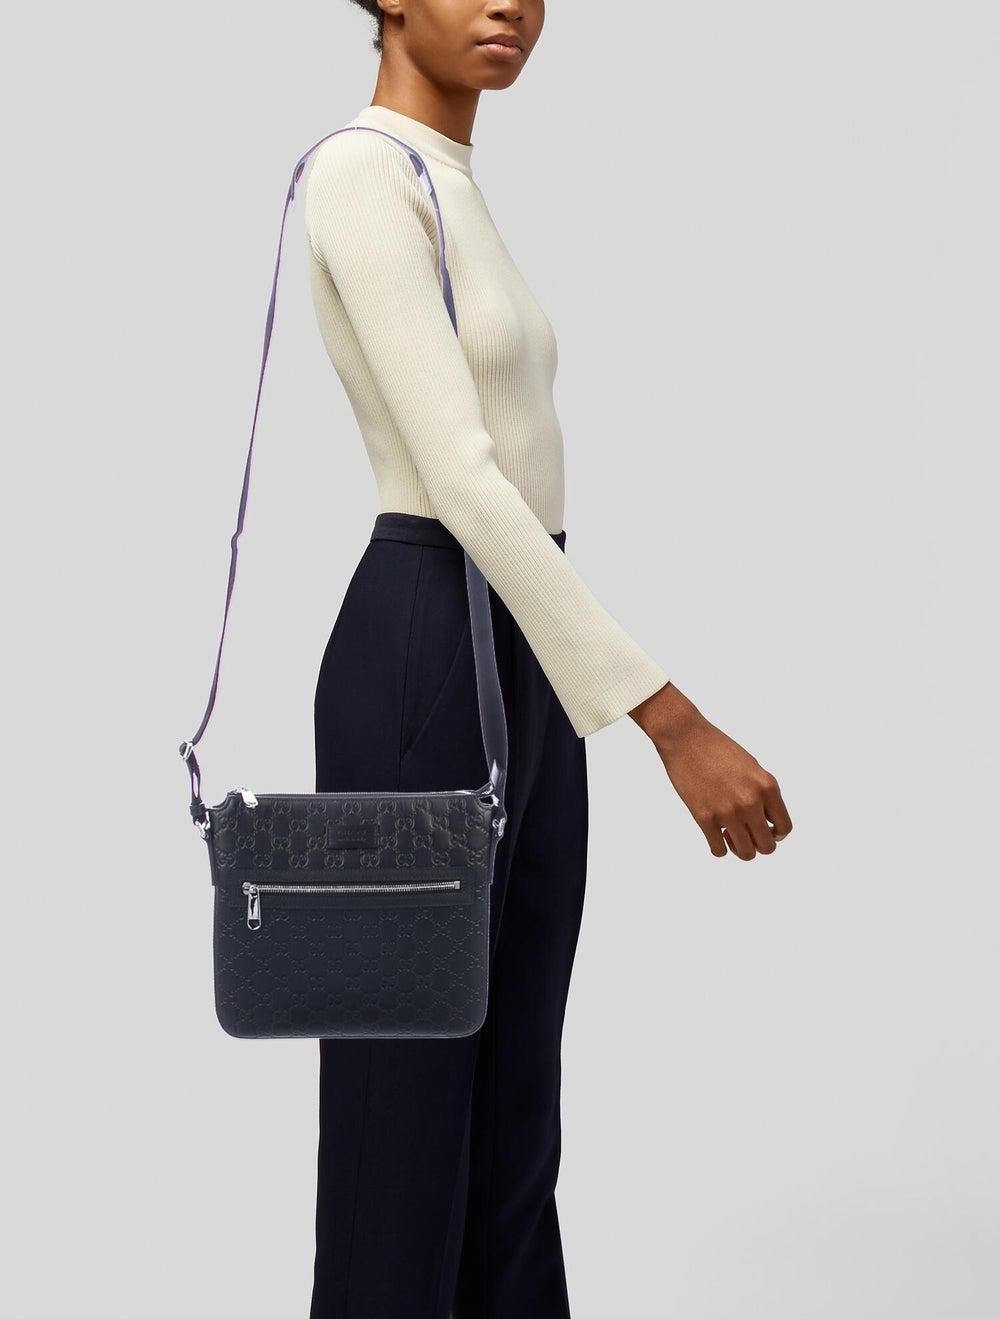 Gucci Signature Messenger Bag Black - image 2